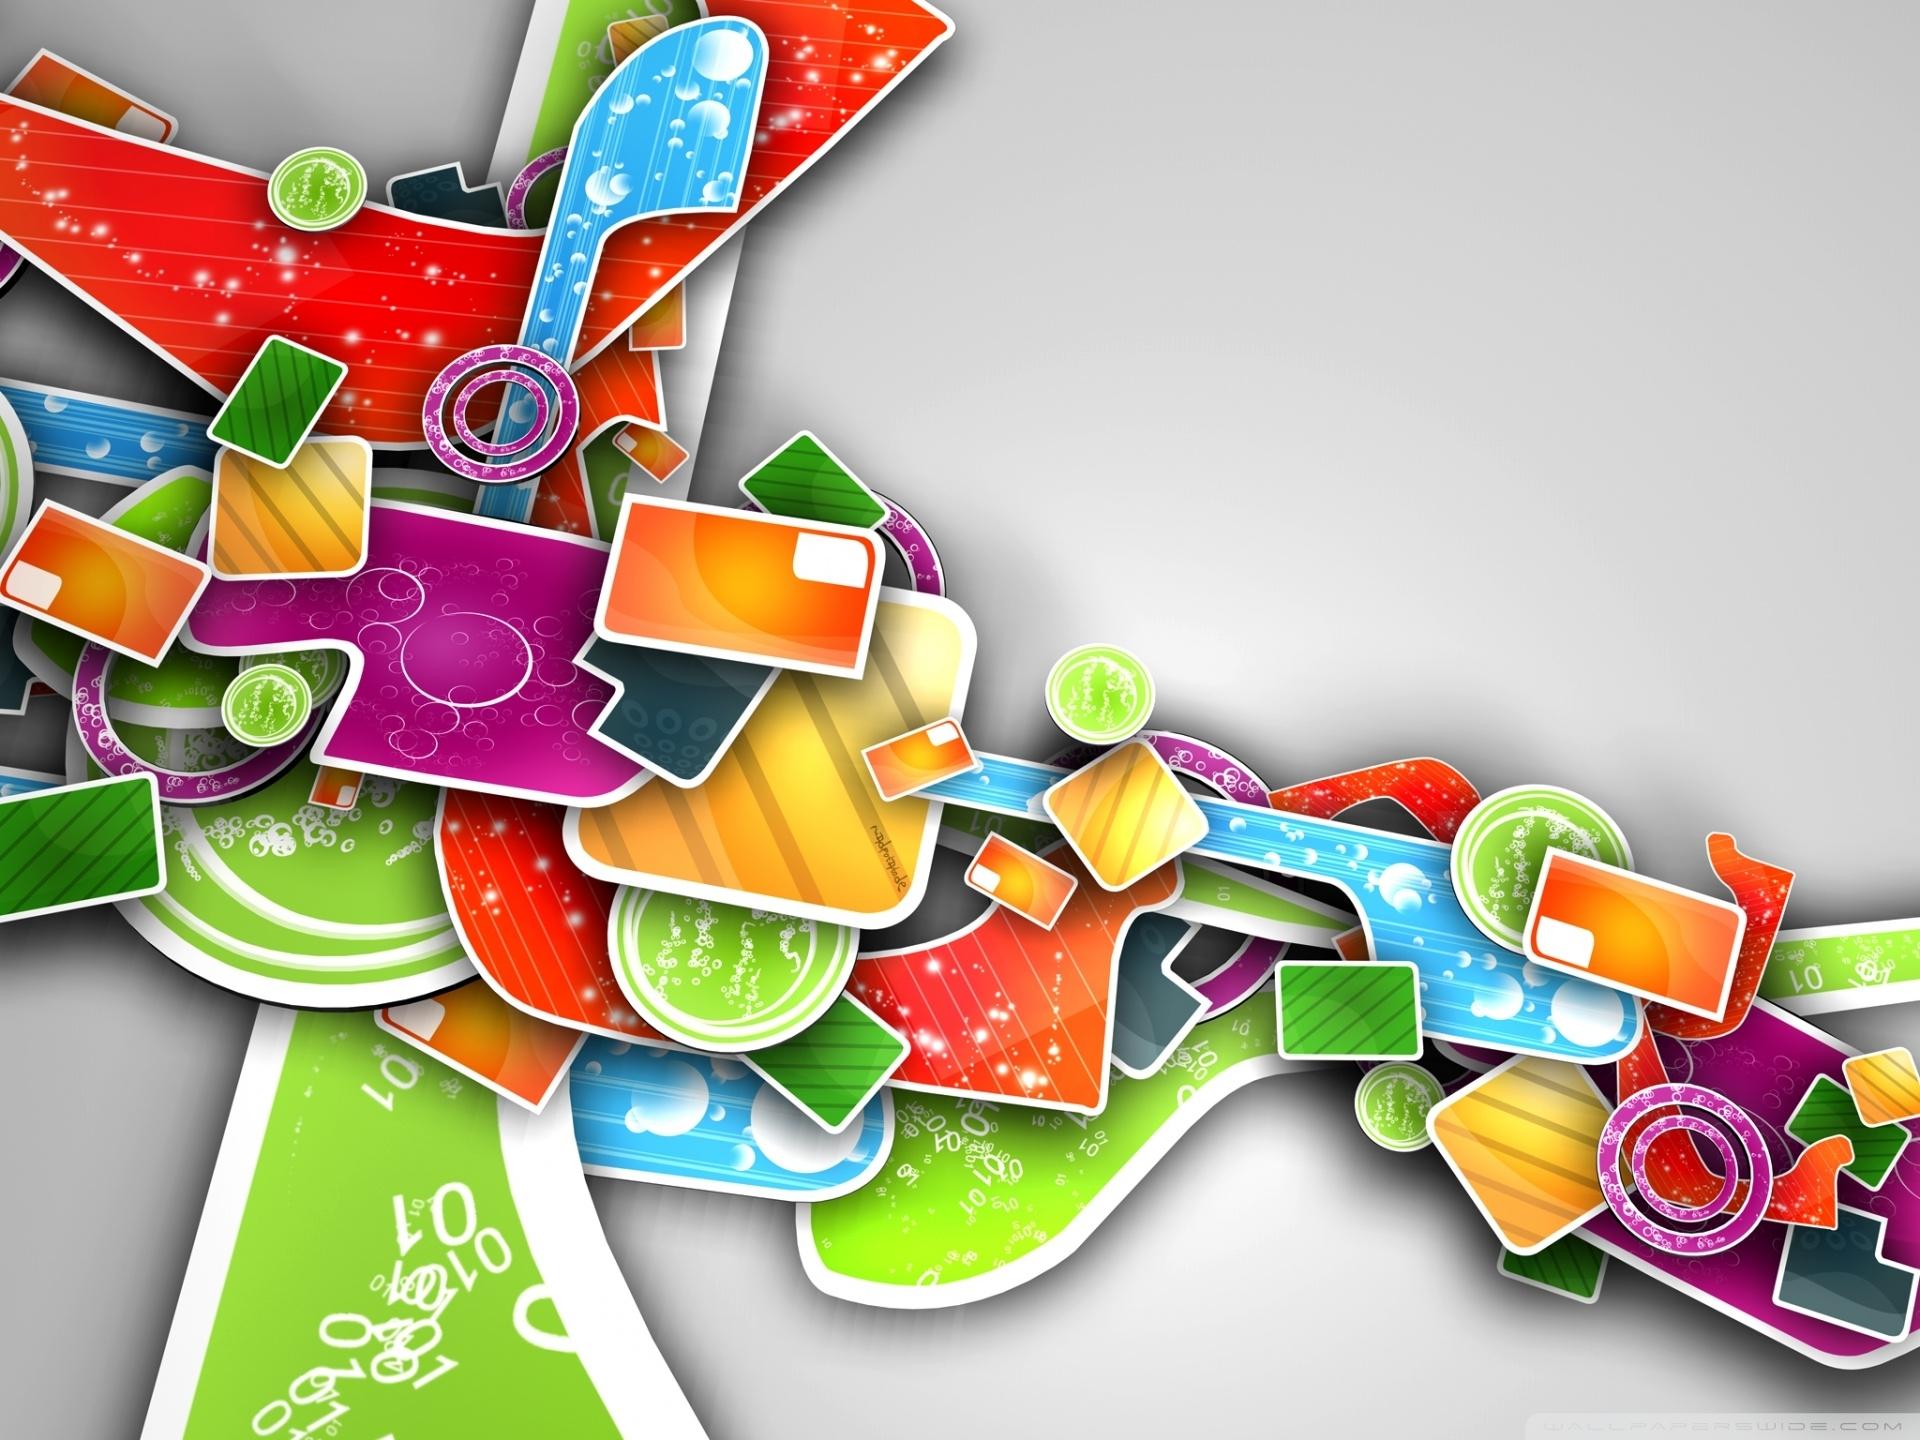 colorful abstract 3d art ❤ 4k hd desktop wallpaper for 4k ultra hd